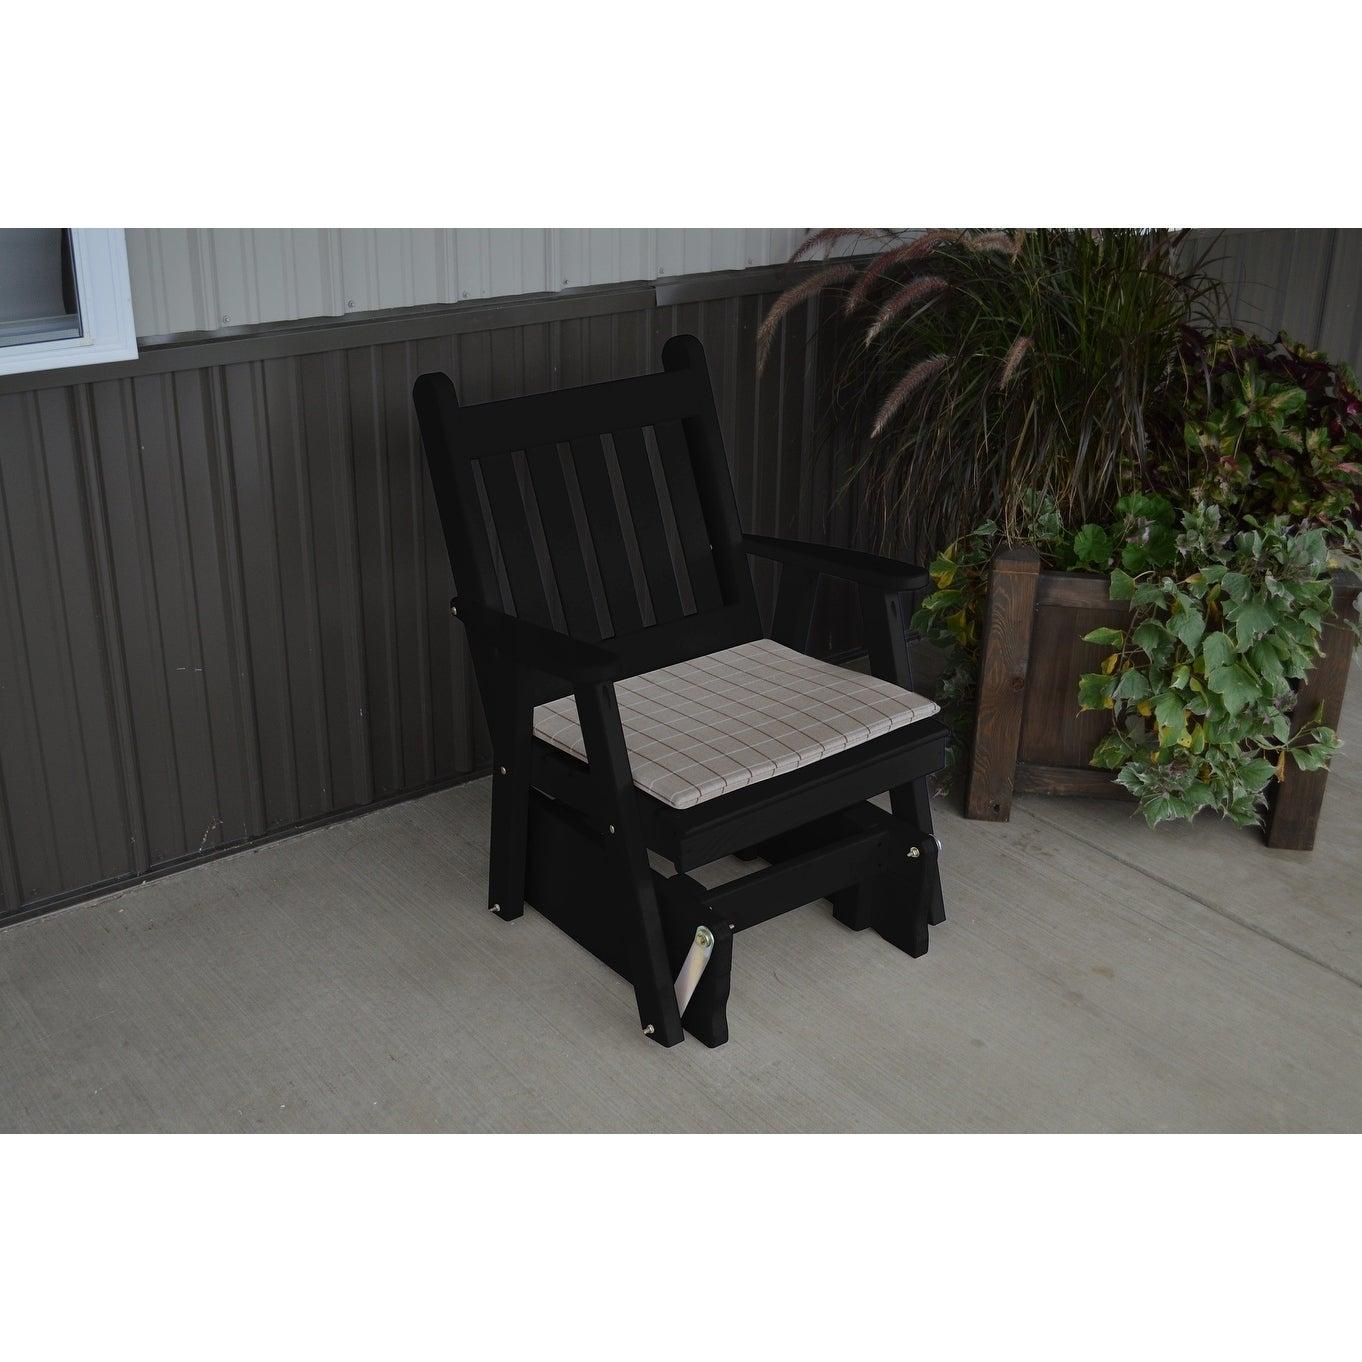 Pine Traditional English Gliding Chair Intended For Traditional English Glider Benches (View 15 of 25)